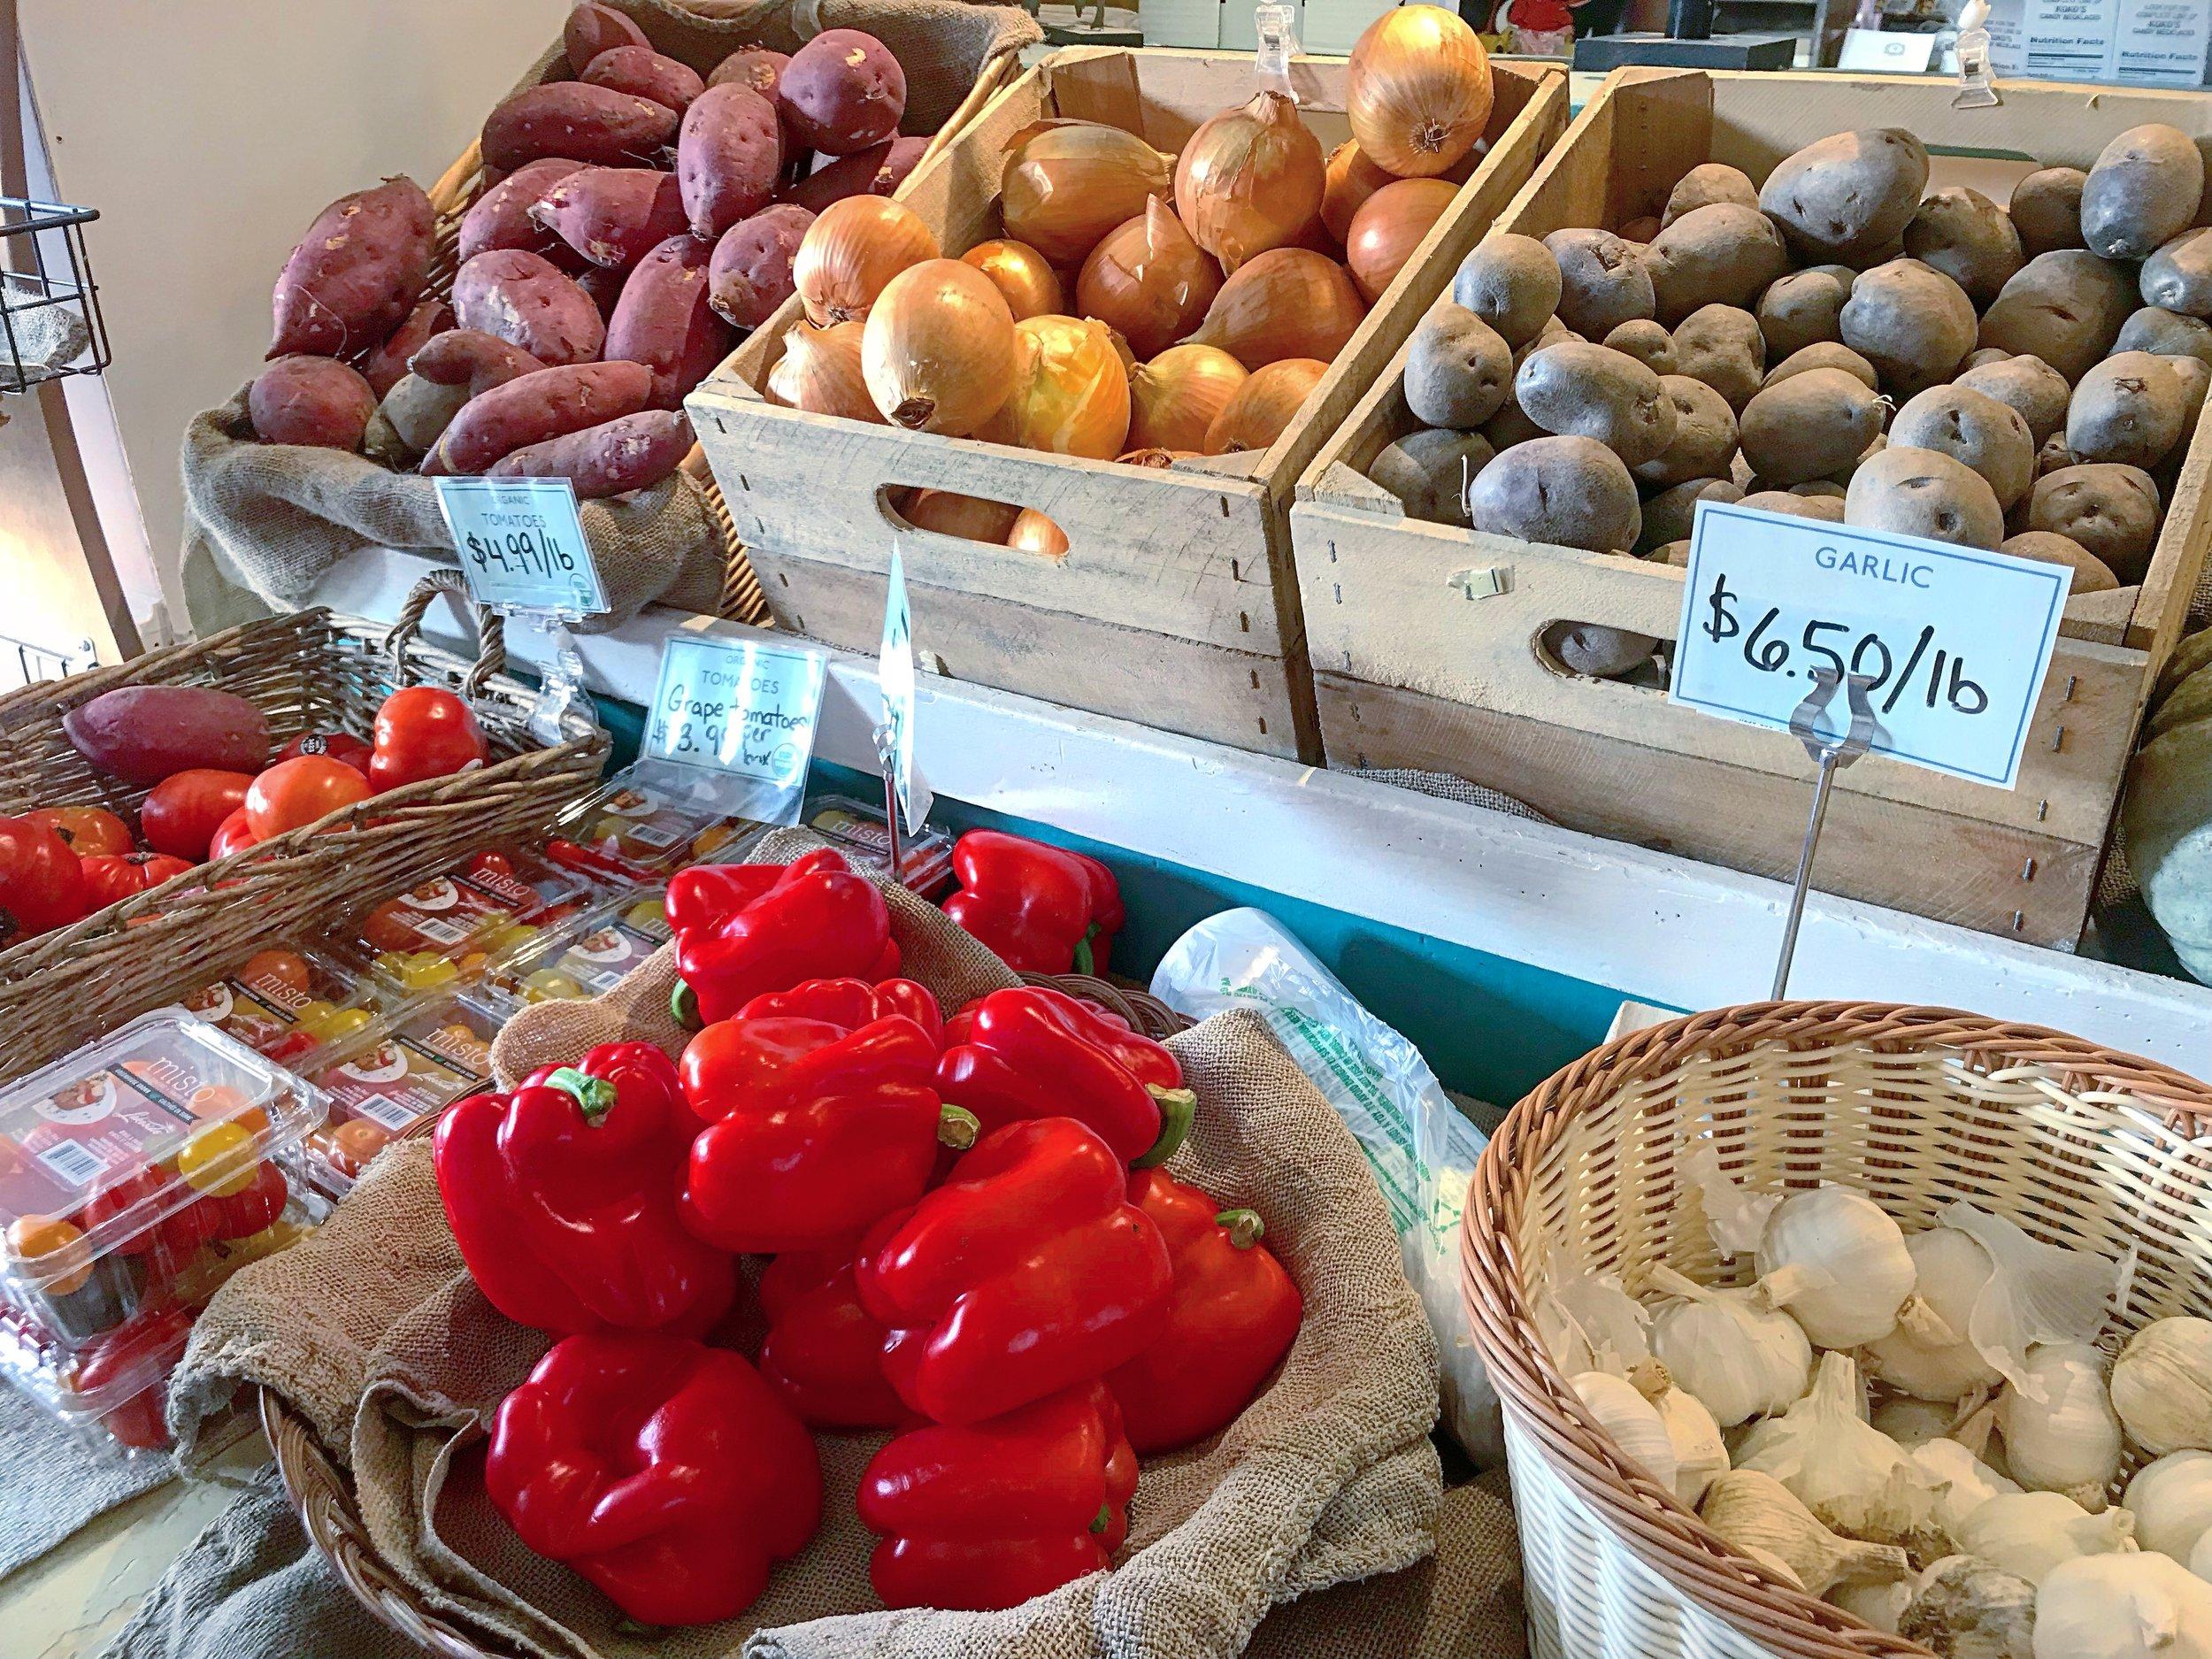 Fishkill Farms organic produce.